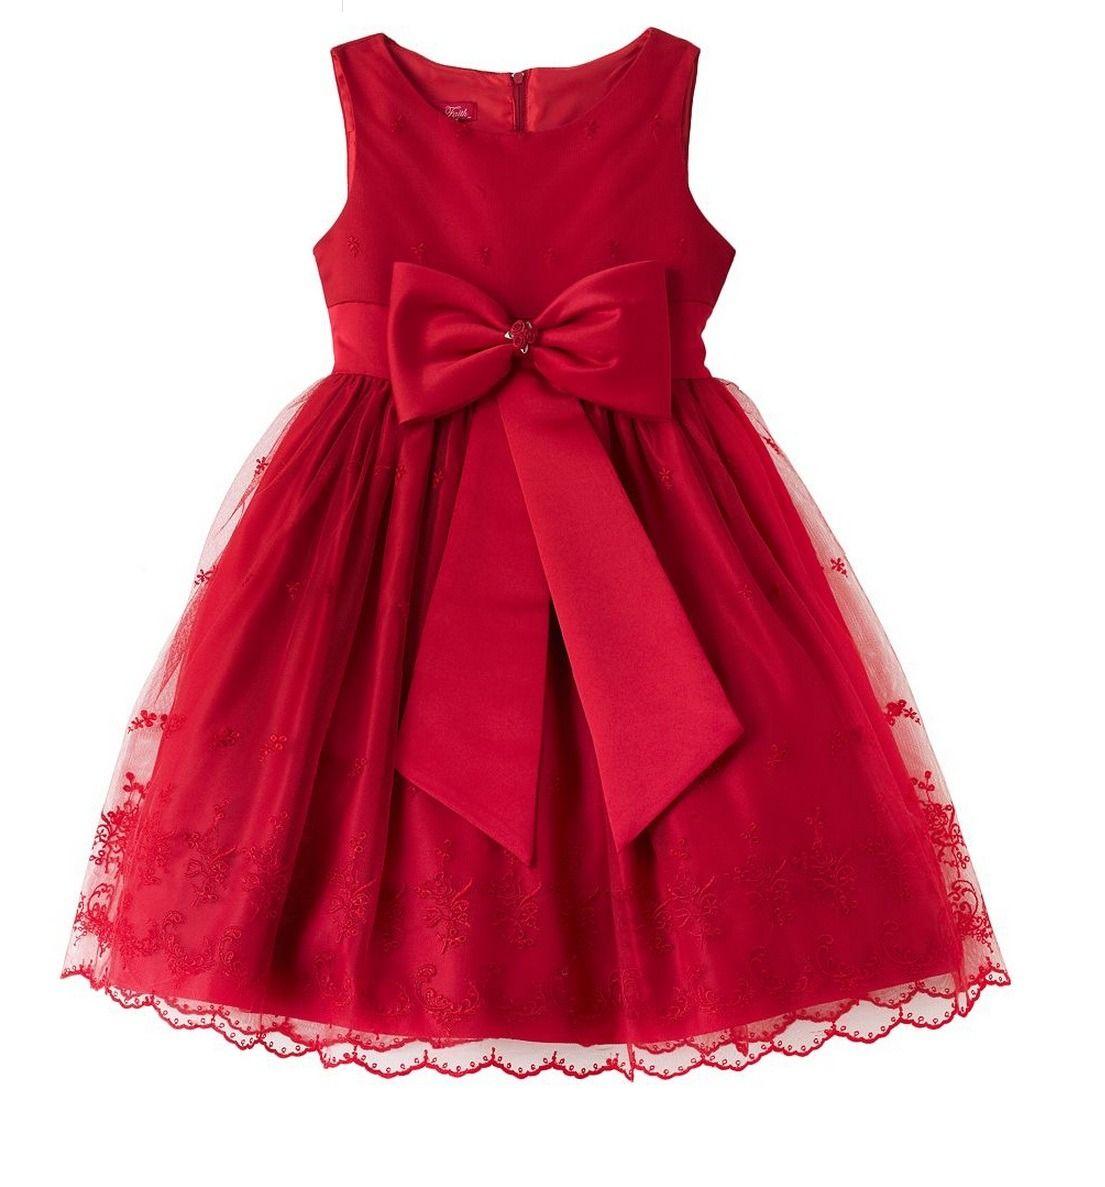 842d44012 Vestido De Festa Princess 2 Anos | Vir my kleindogtertjie Annelie ...